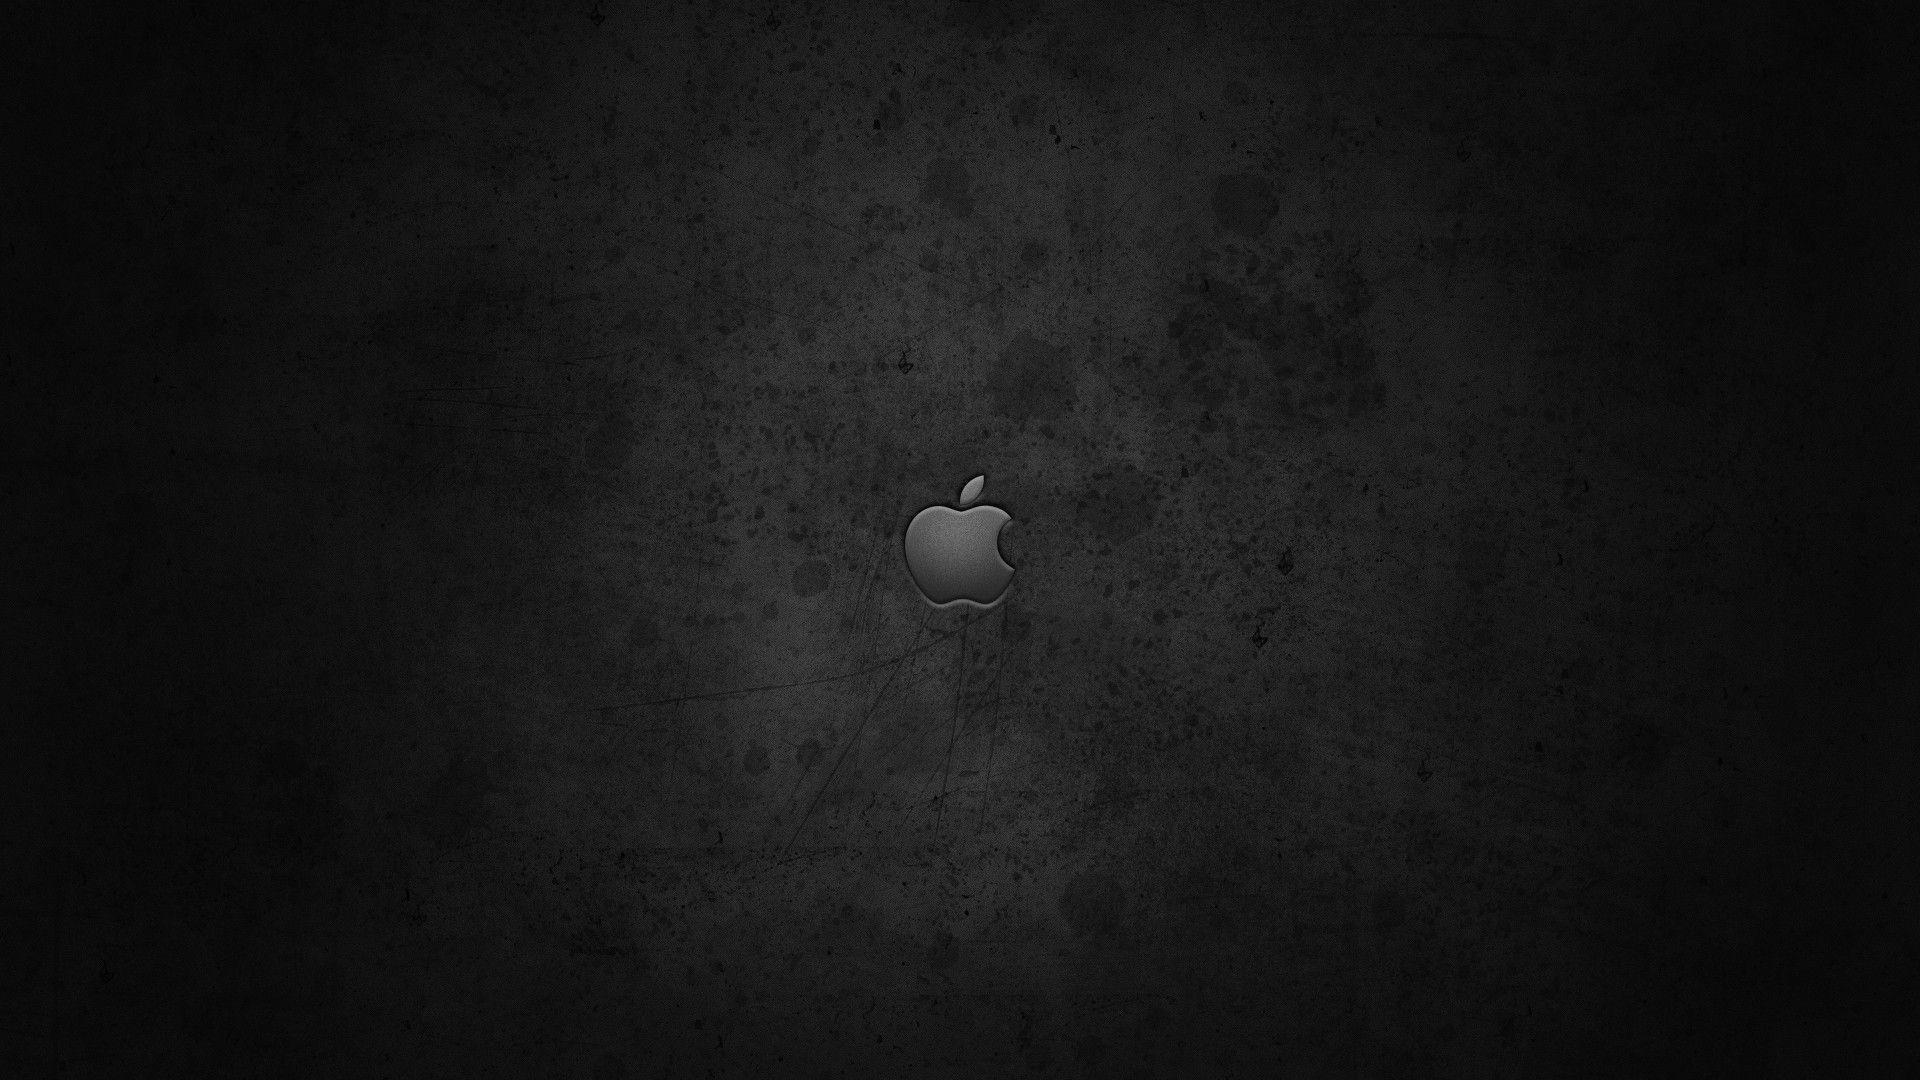 Hd Wallpapers 1080p Mac 65 Images